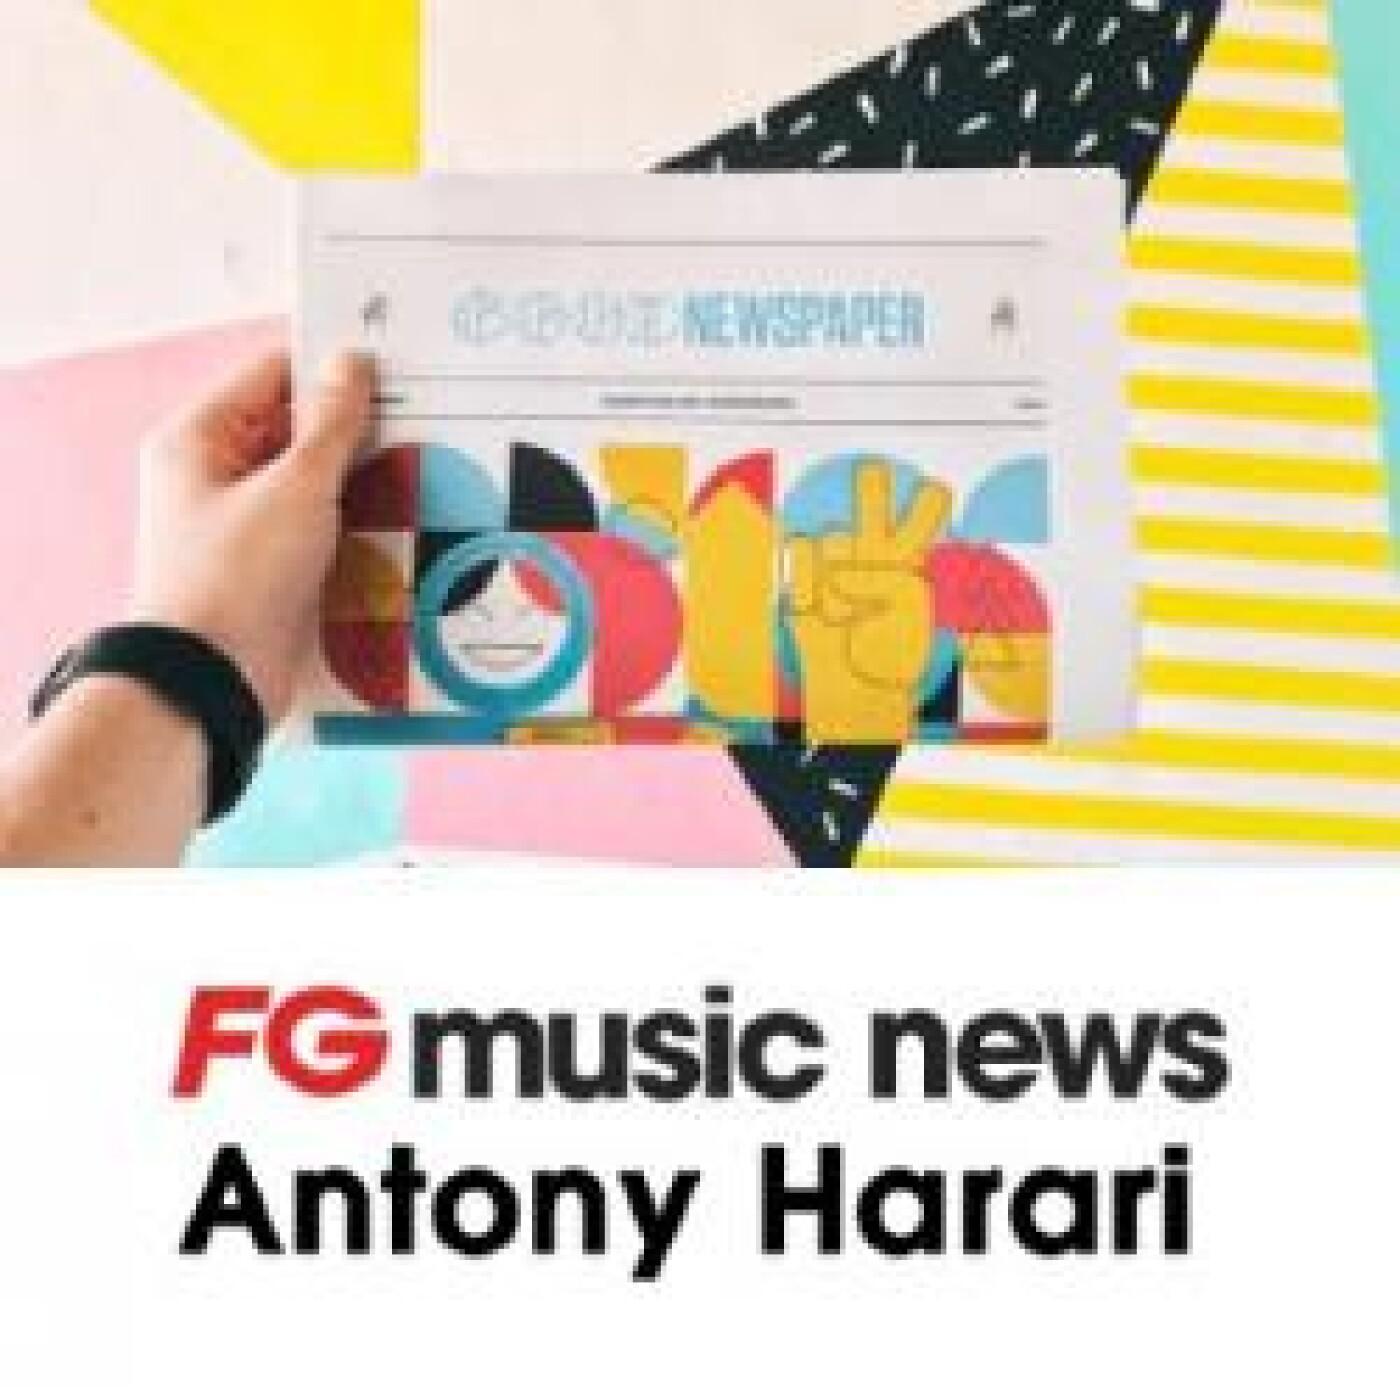 FG MUSIC NEWS : Knock Me Out, la collab Ferreck Dawn & Guz